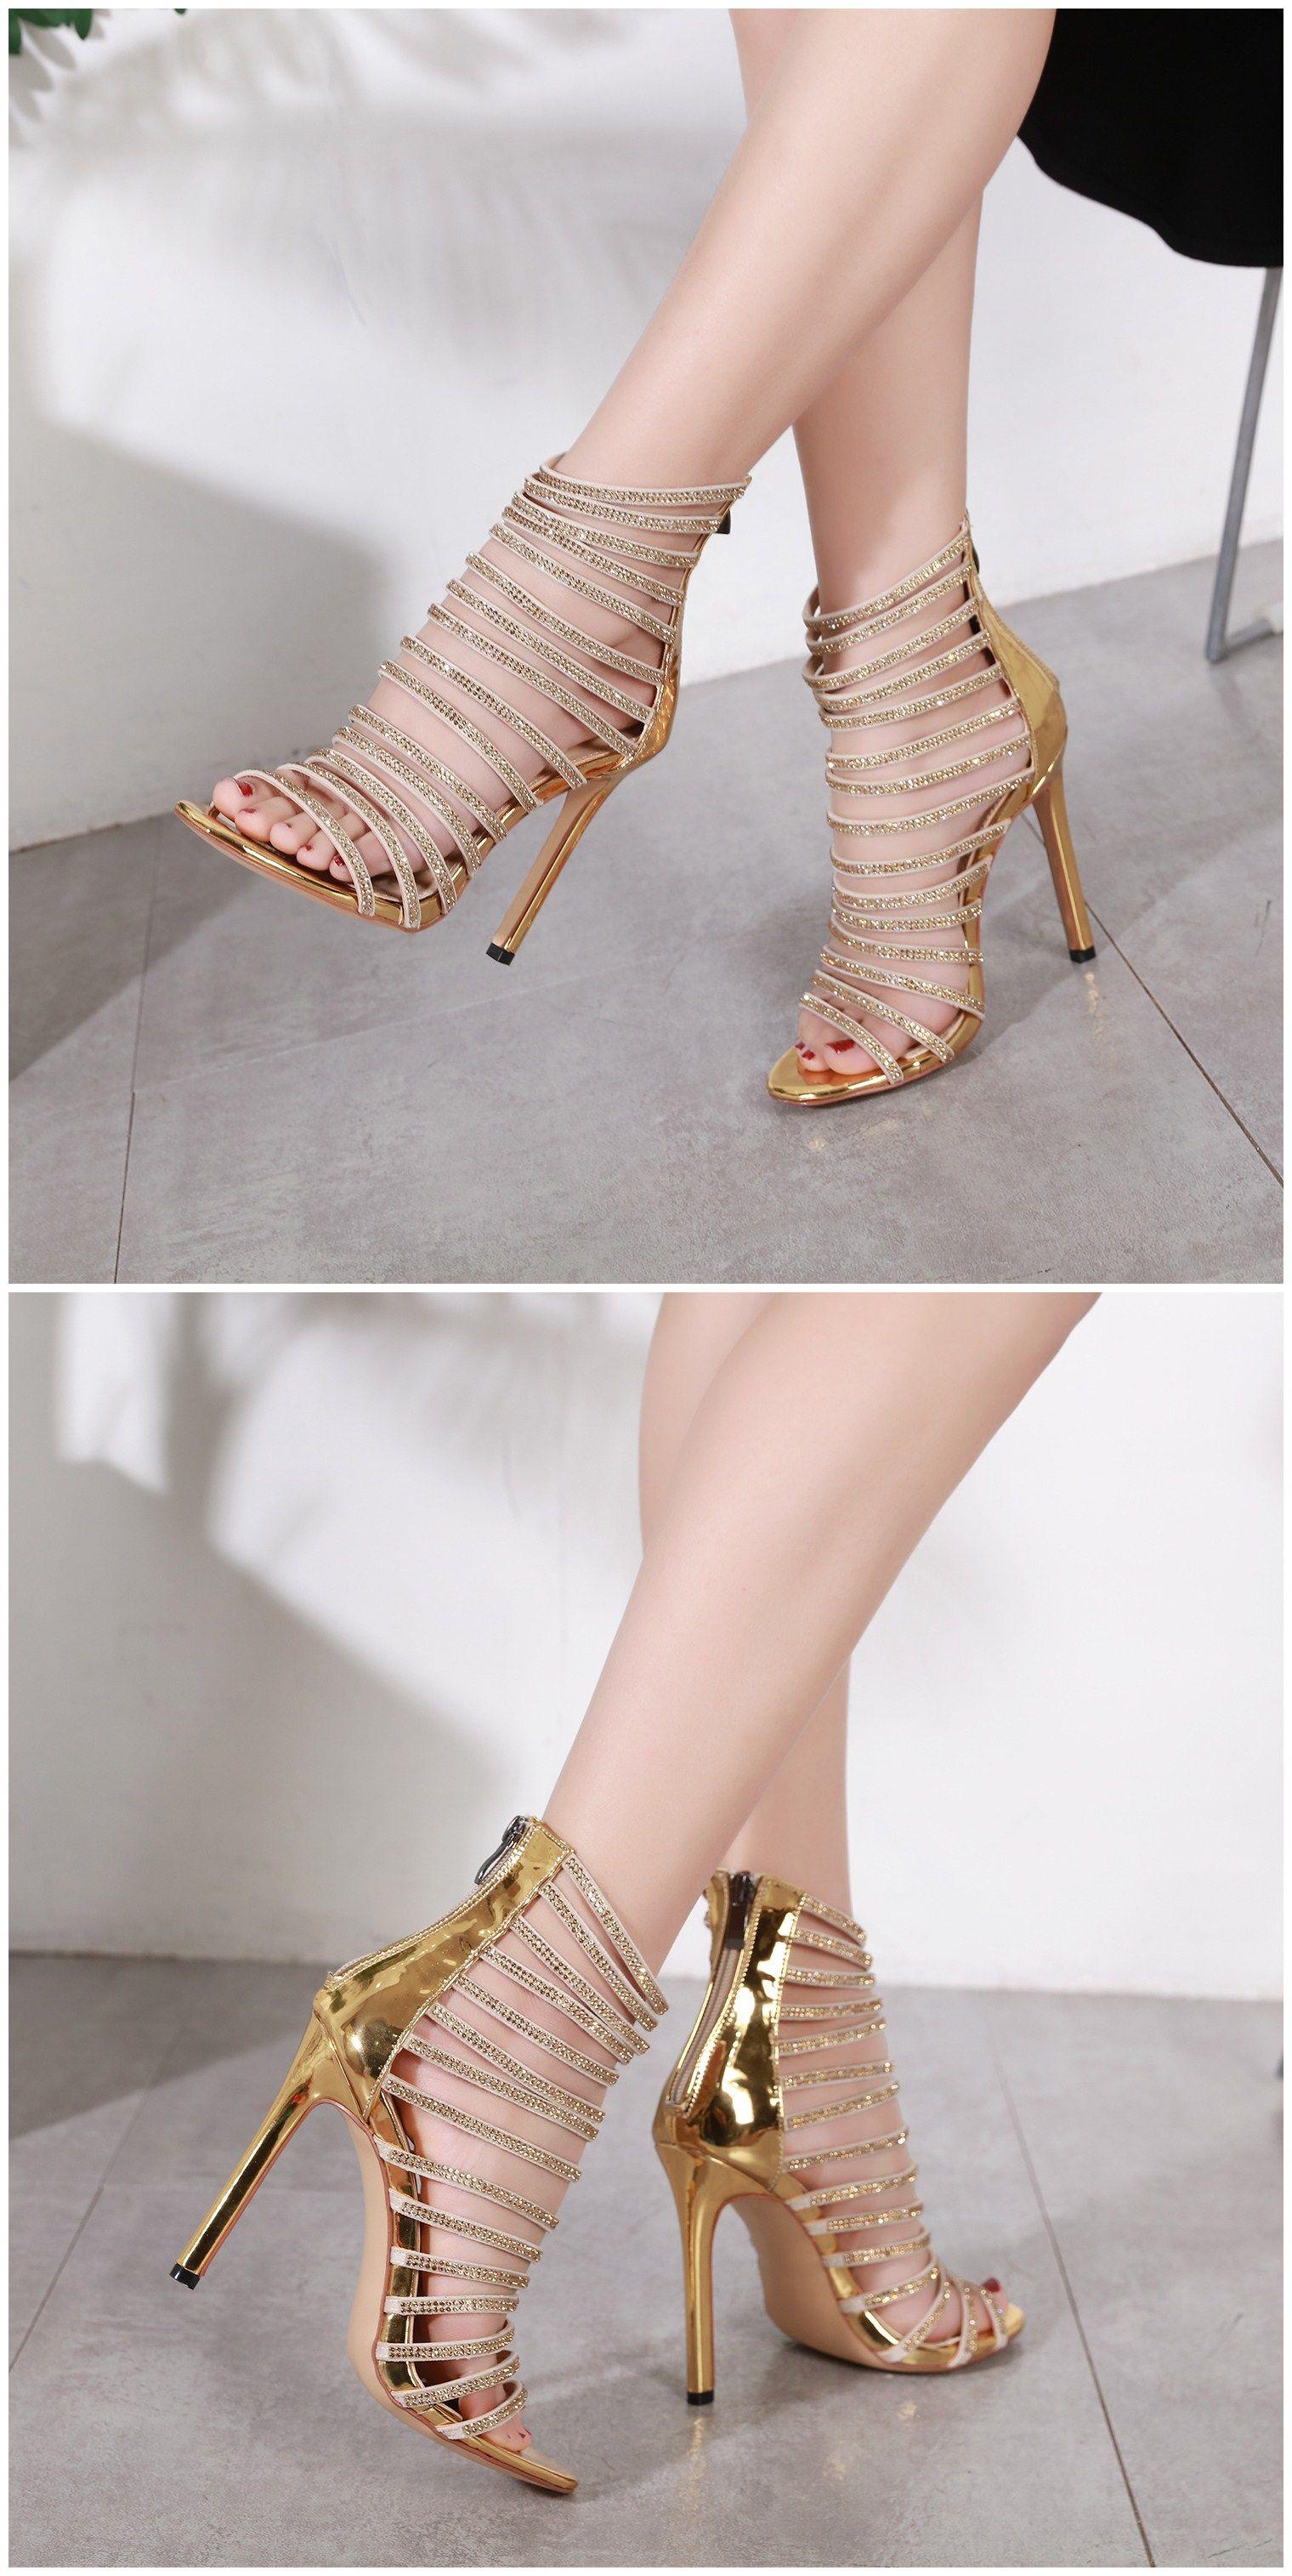 7def95db7351 Rhinestone Lace Buckle Gold Heels Sandals for Women  tbdressreviews   reviewstbdress  womanfashion  Sandals  highheels